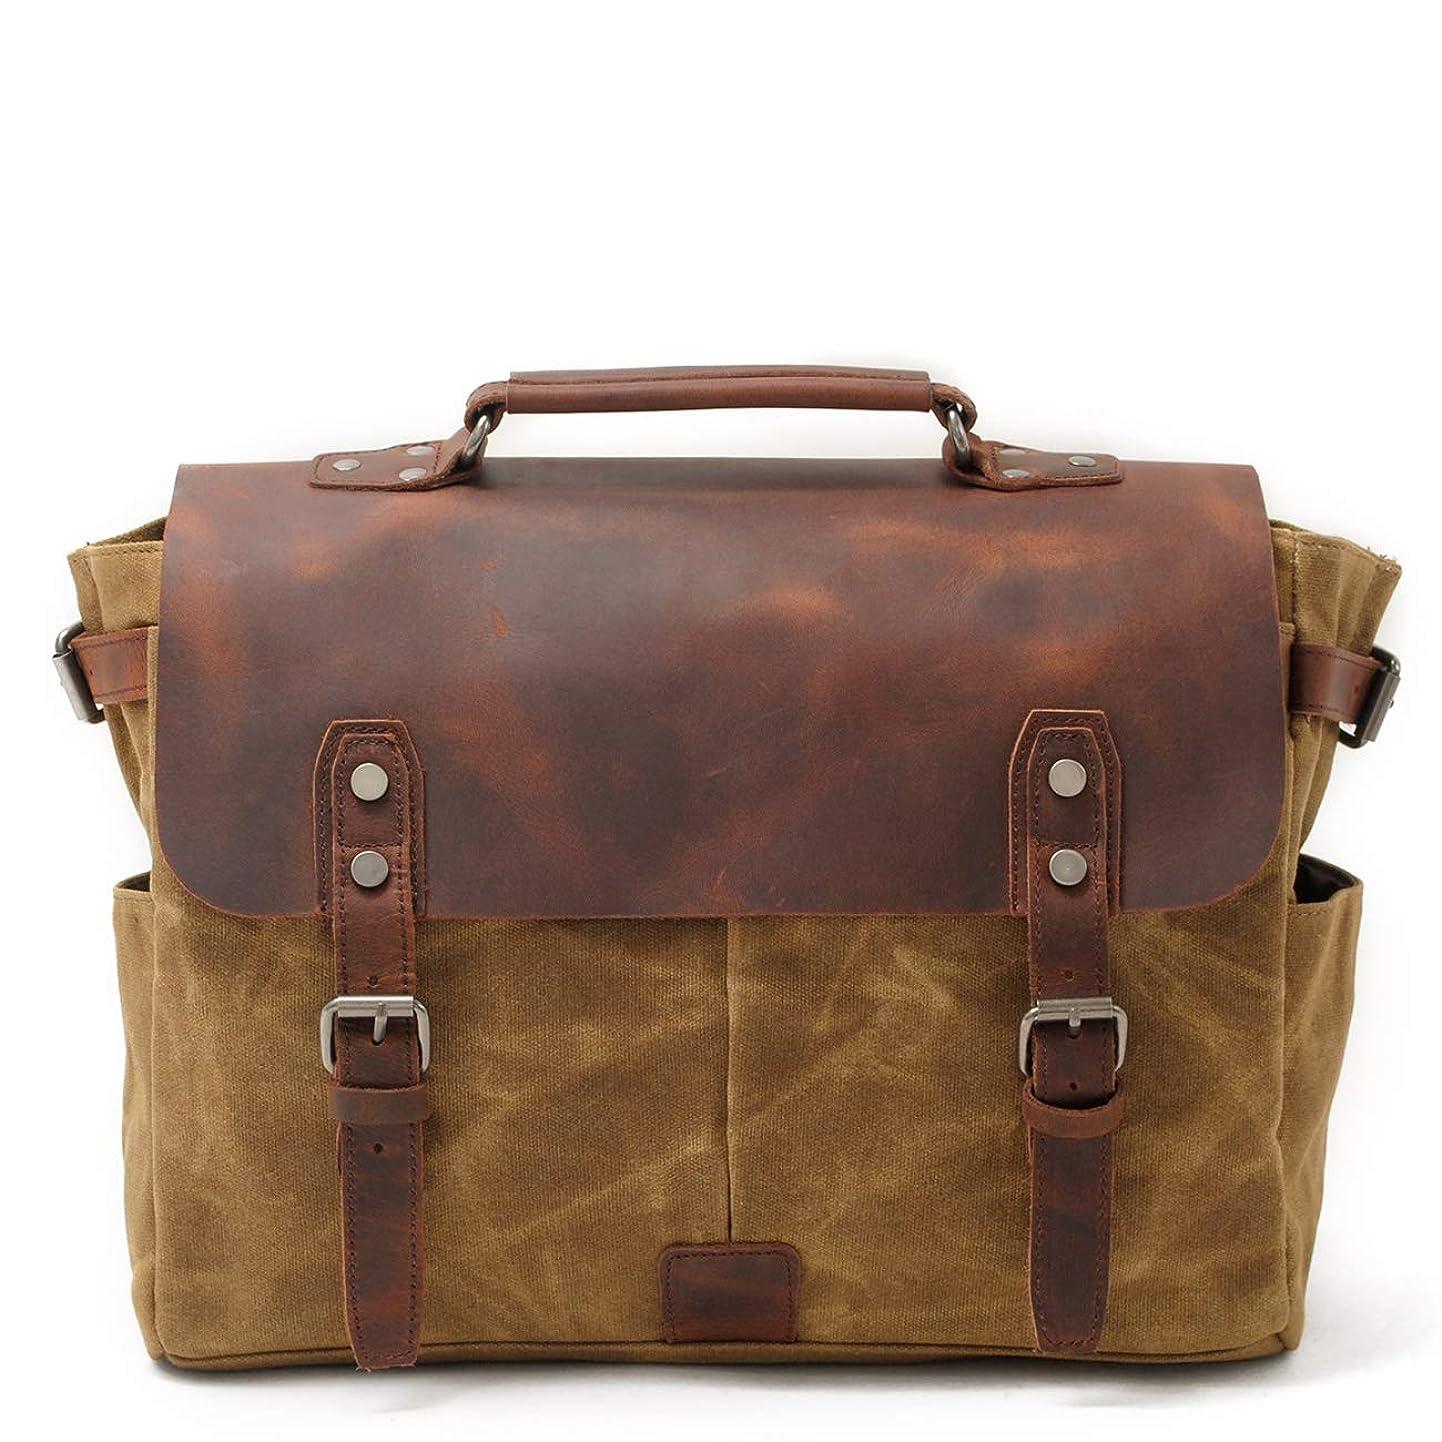 Mens Messenger Bag,Handmade Cross Body Bag Leather Laptop Briefcase Waxed Canvas Shoulder Bag with Detachable Strap,Computer Sctchel Bag Travel Work Bag for 14 inches Laptop rhbykpkiigg0